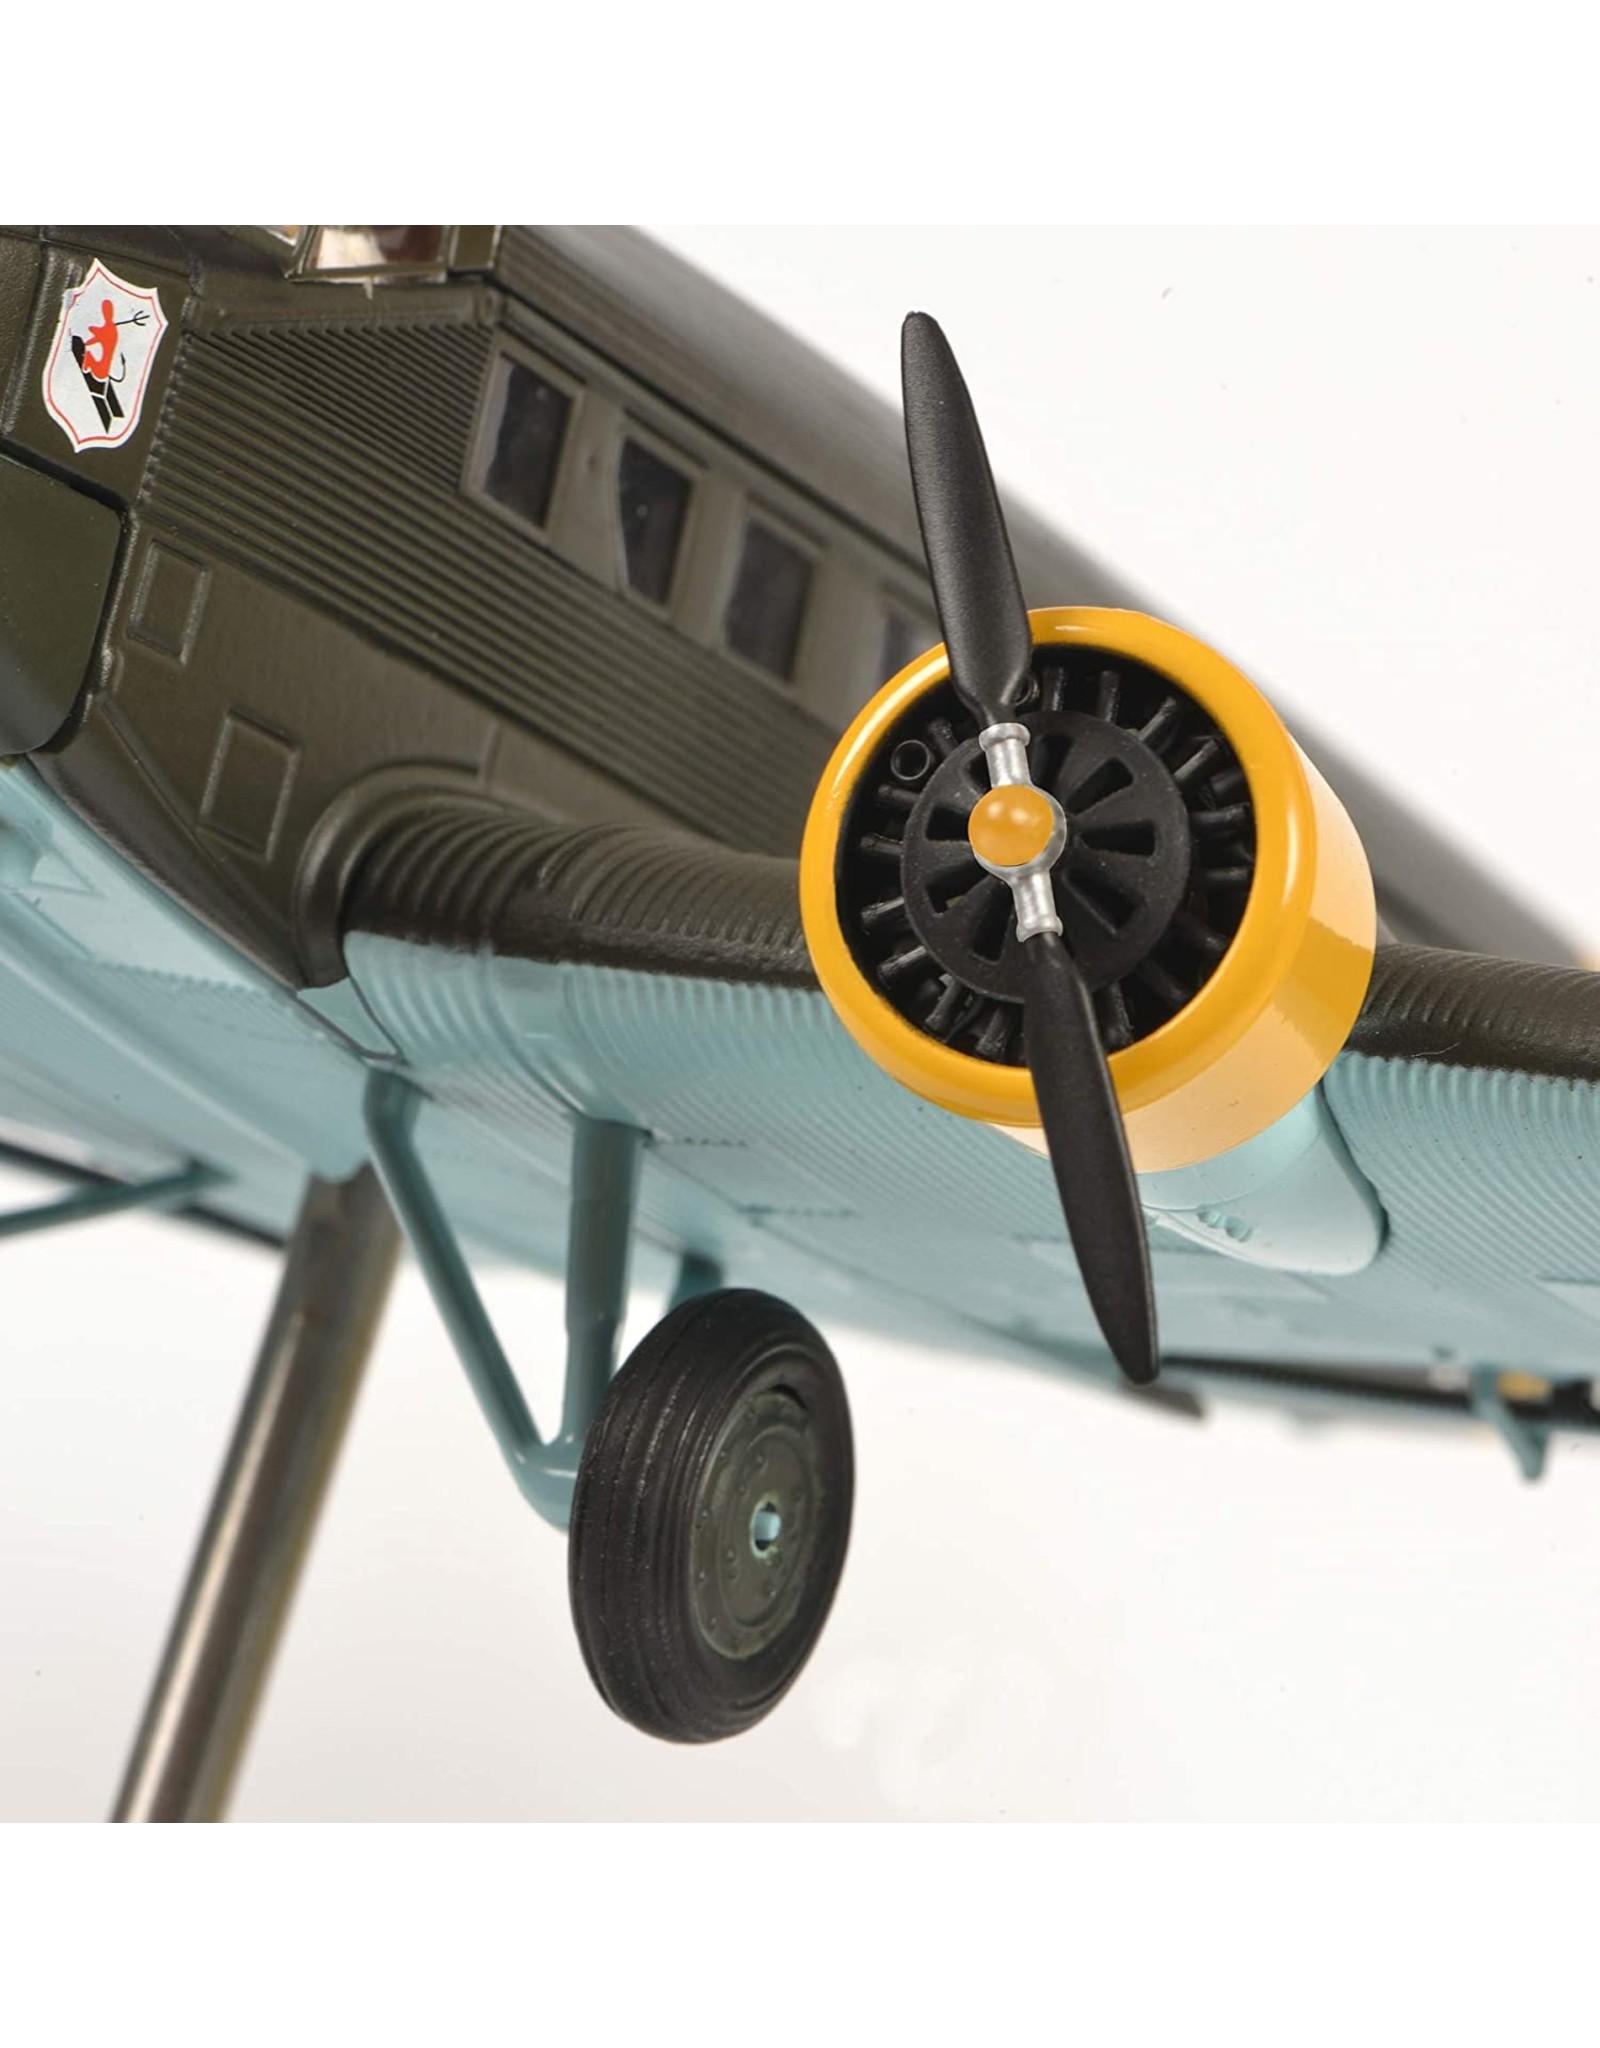 "Junkers Junkers Ju52/3m ""Amicale Jean-Baptiste Salis"" - 1:72 - Schuco"